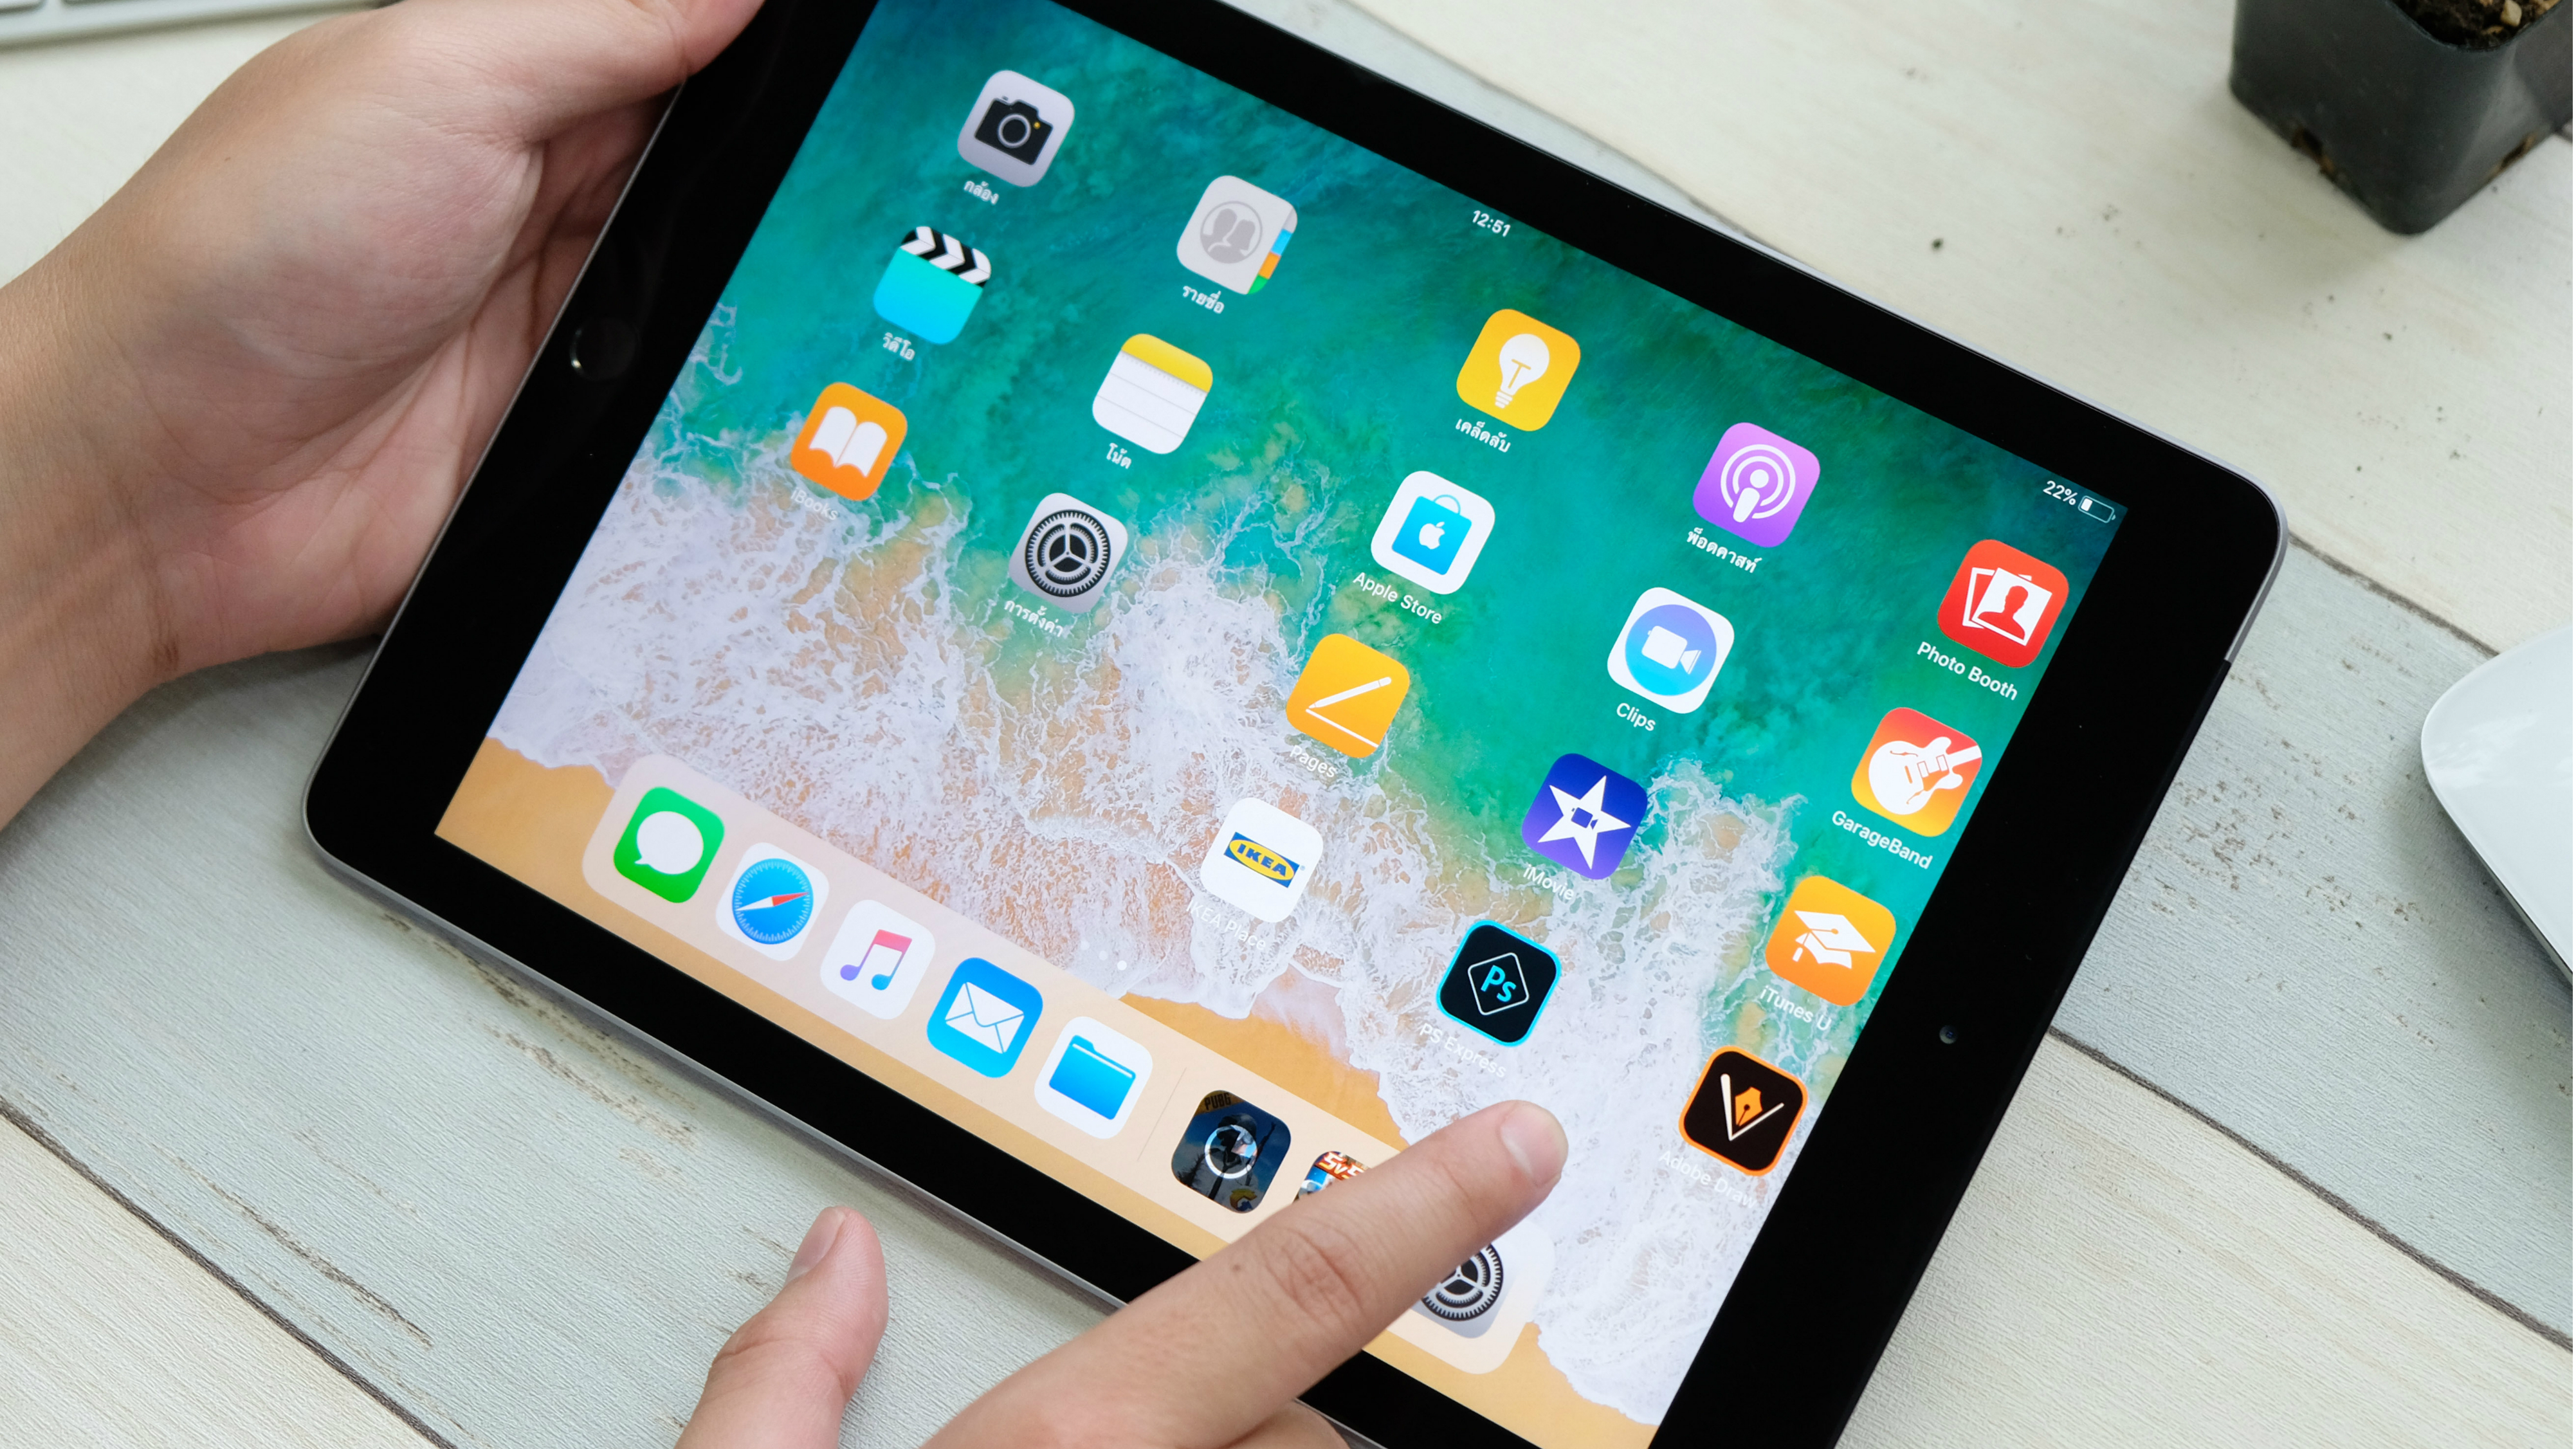 Walmart iPad sale: the latest Apple iPad gets a $100 price